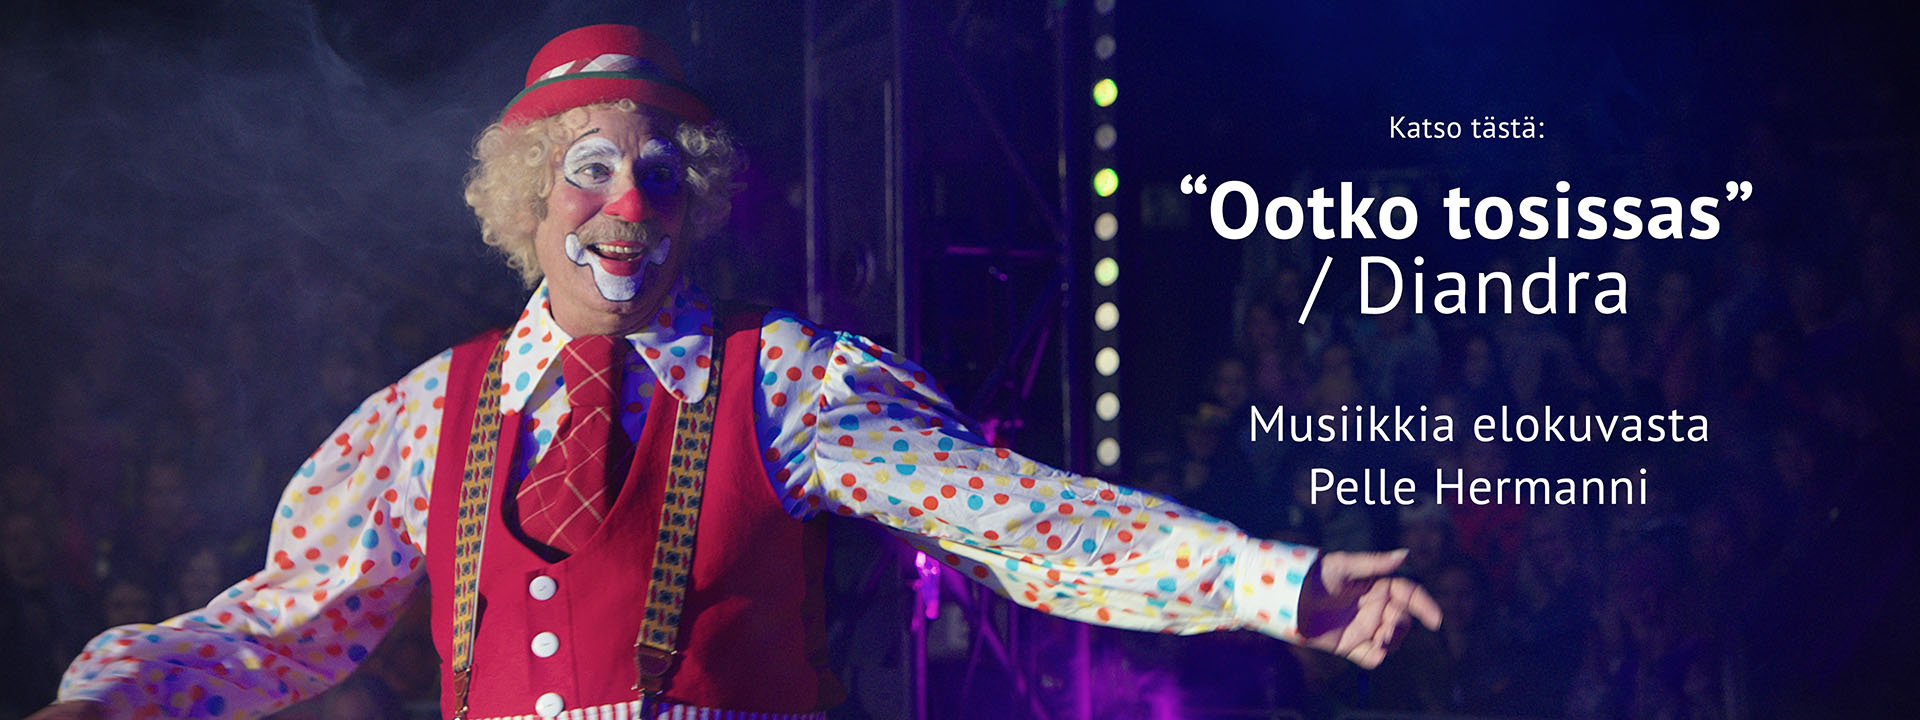 Olavi Virta -elokuva